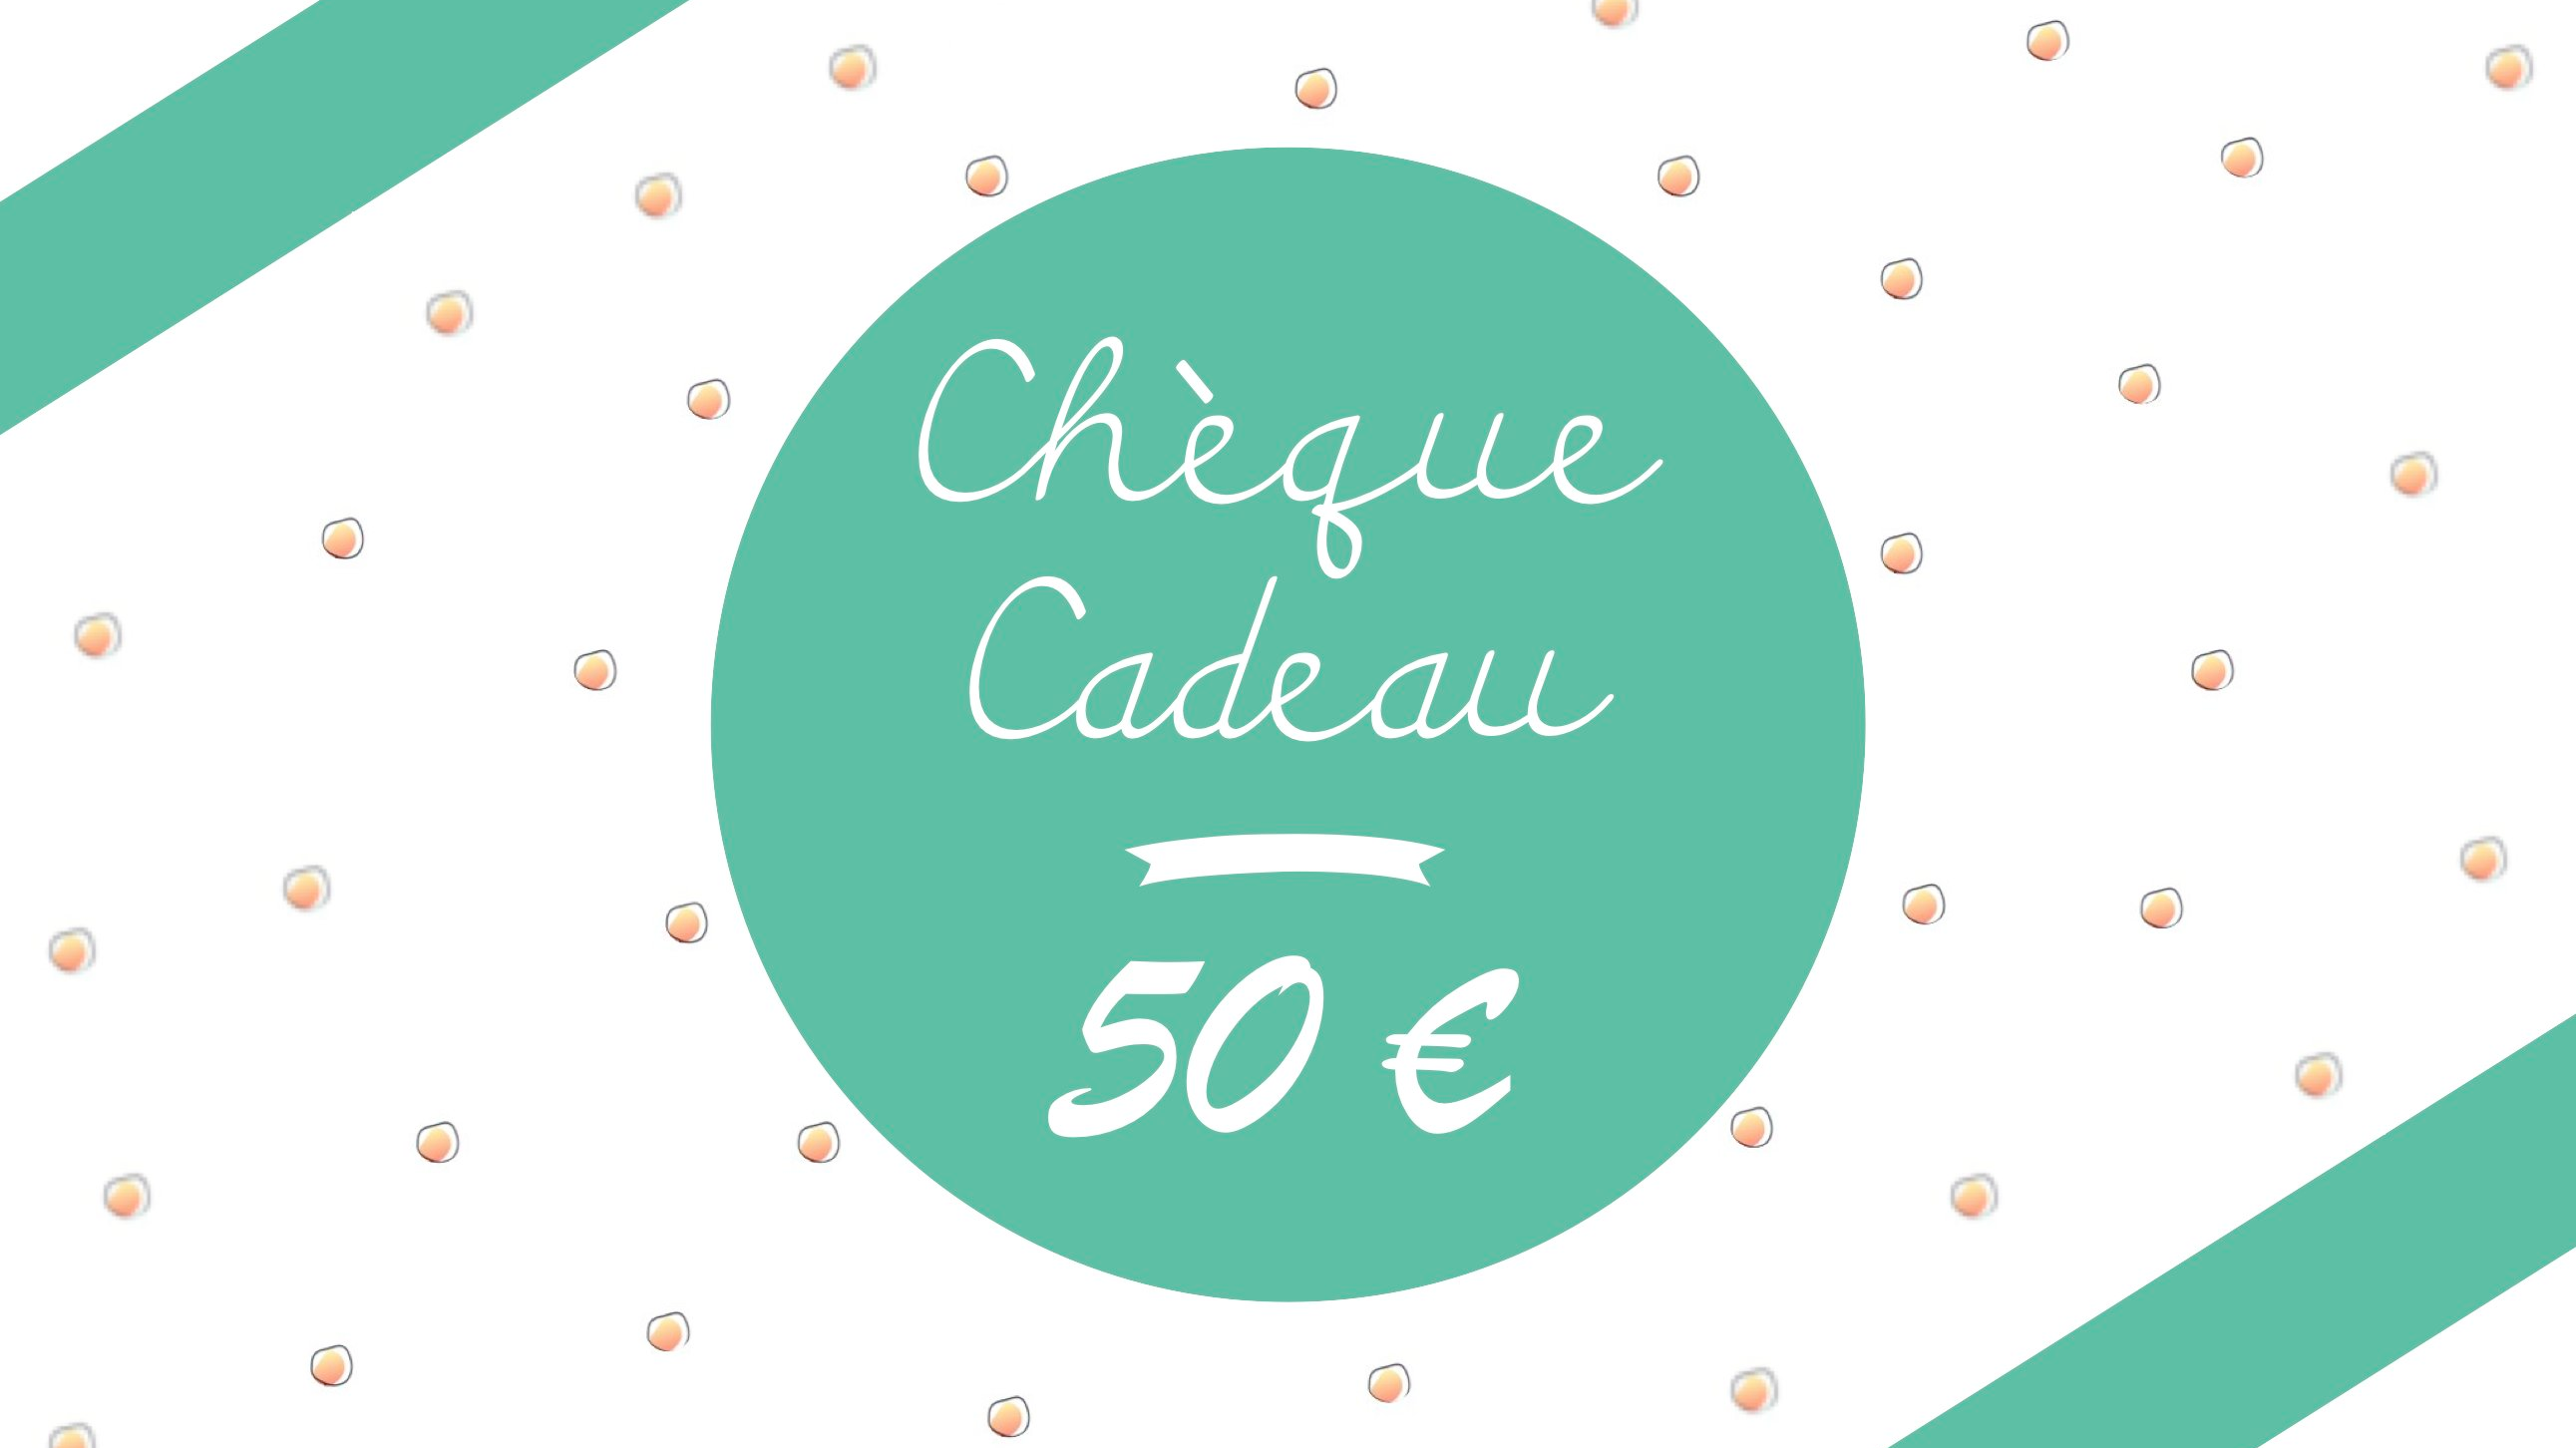 visuel_40_euros-cheque-1523542315.jpeg